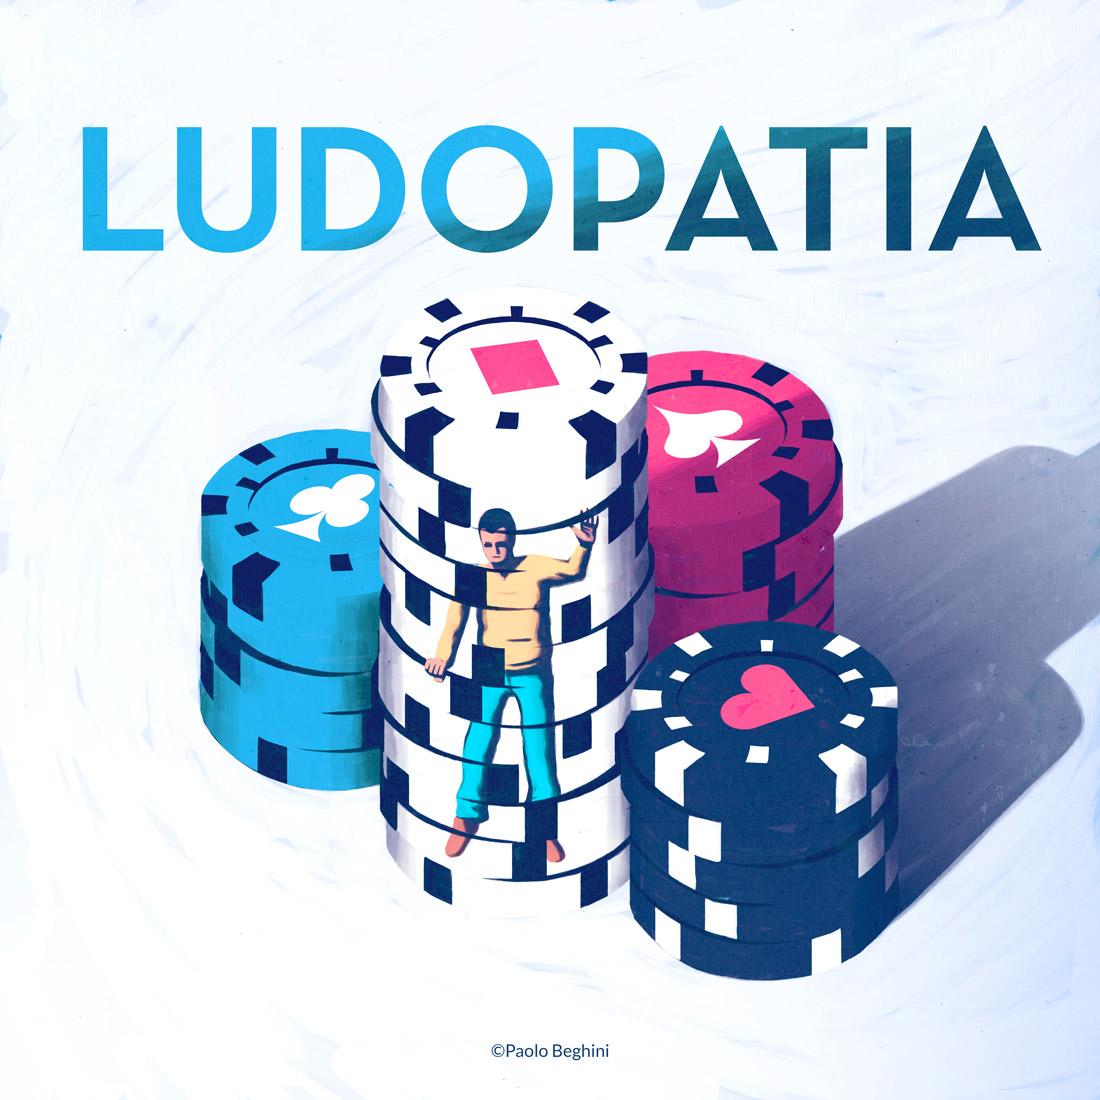 ludopathy